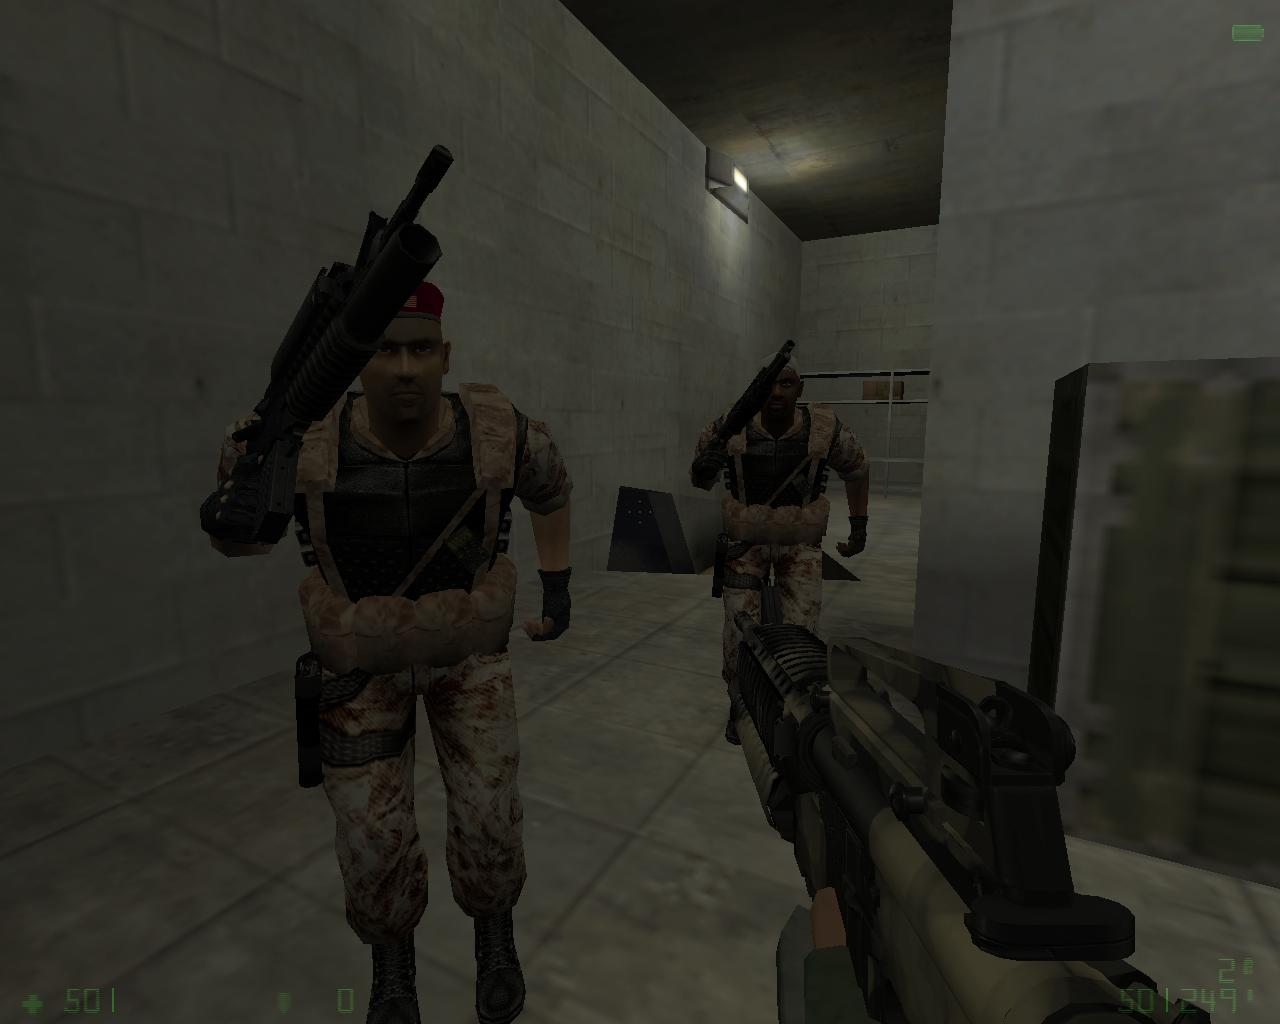 Hecu Ud Textures Image Half Life Opposing Force Ud Model Pack